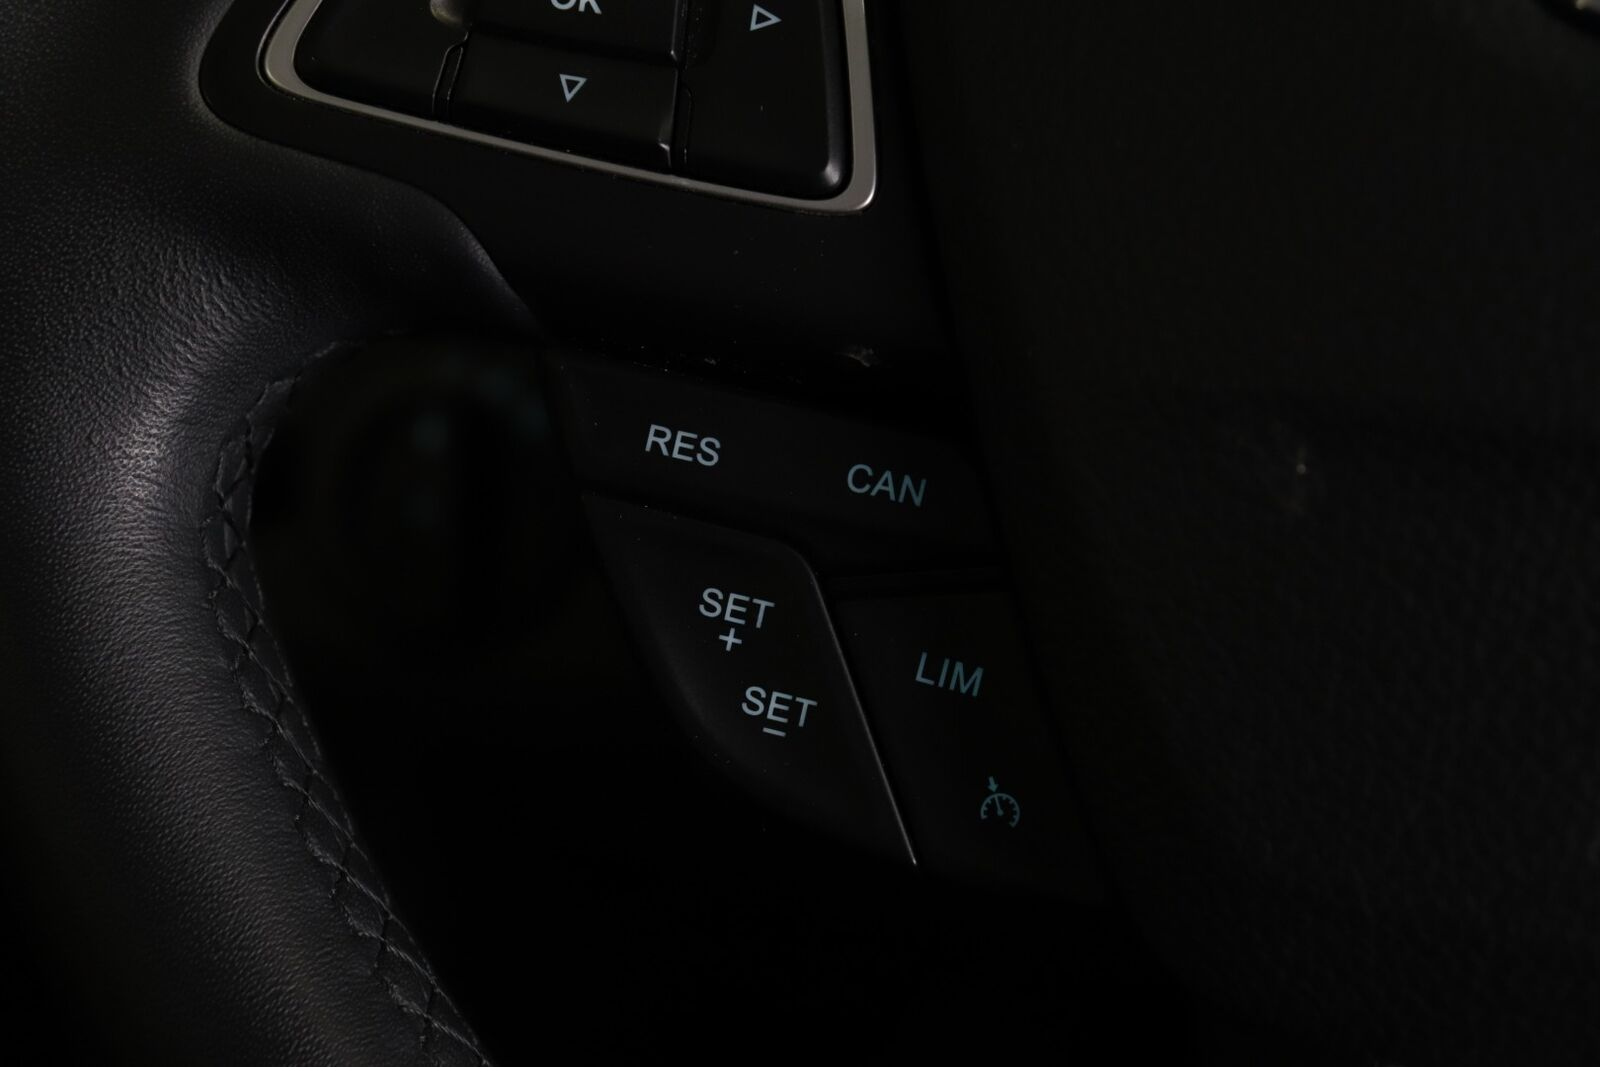 Ford C-MAX TDCi 120 Business aut.